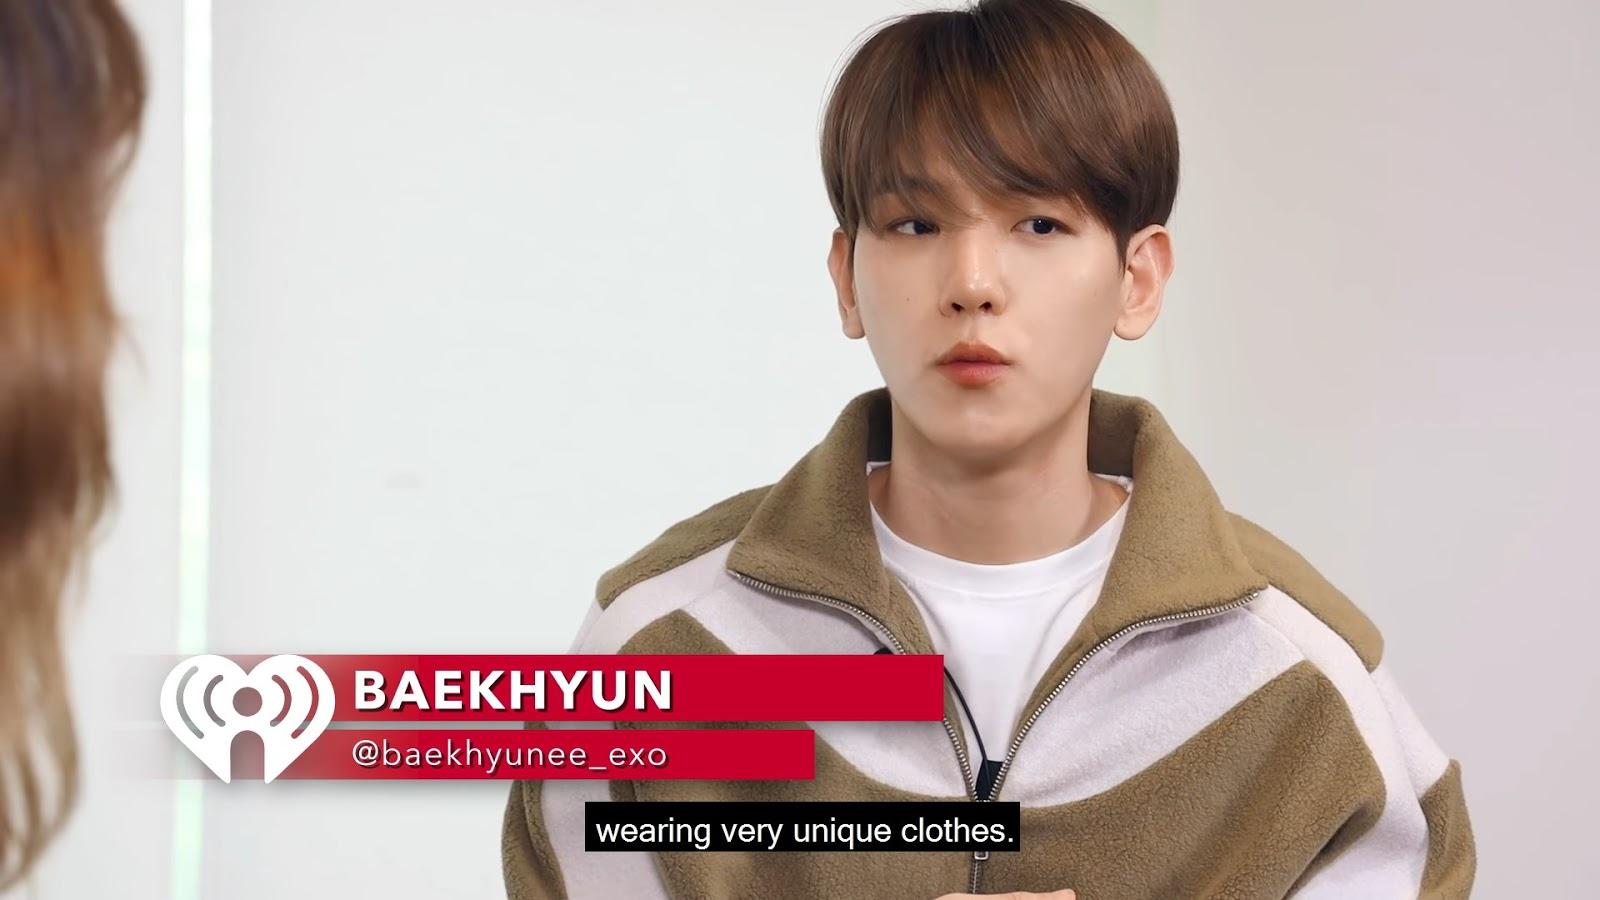 exo baekhyun iheartradio 1